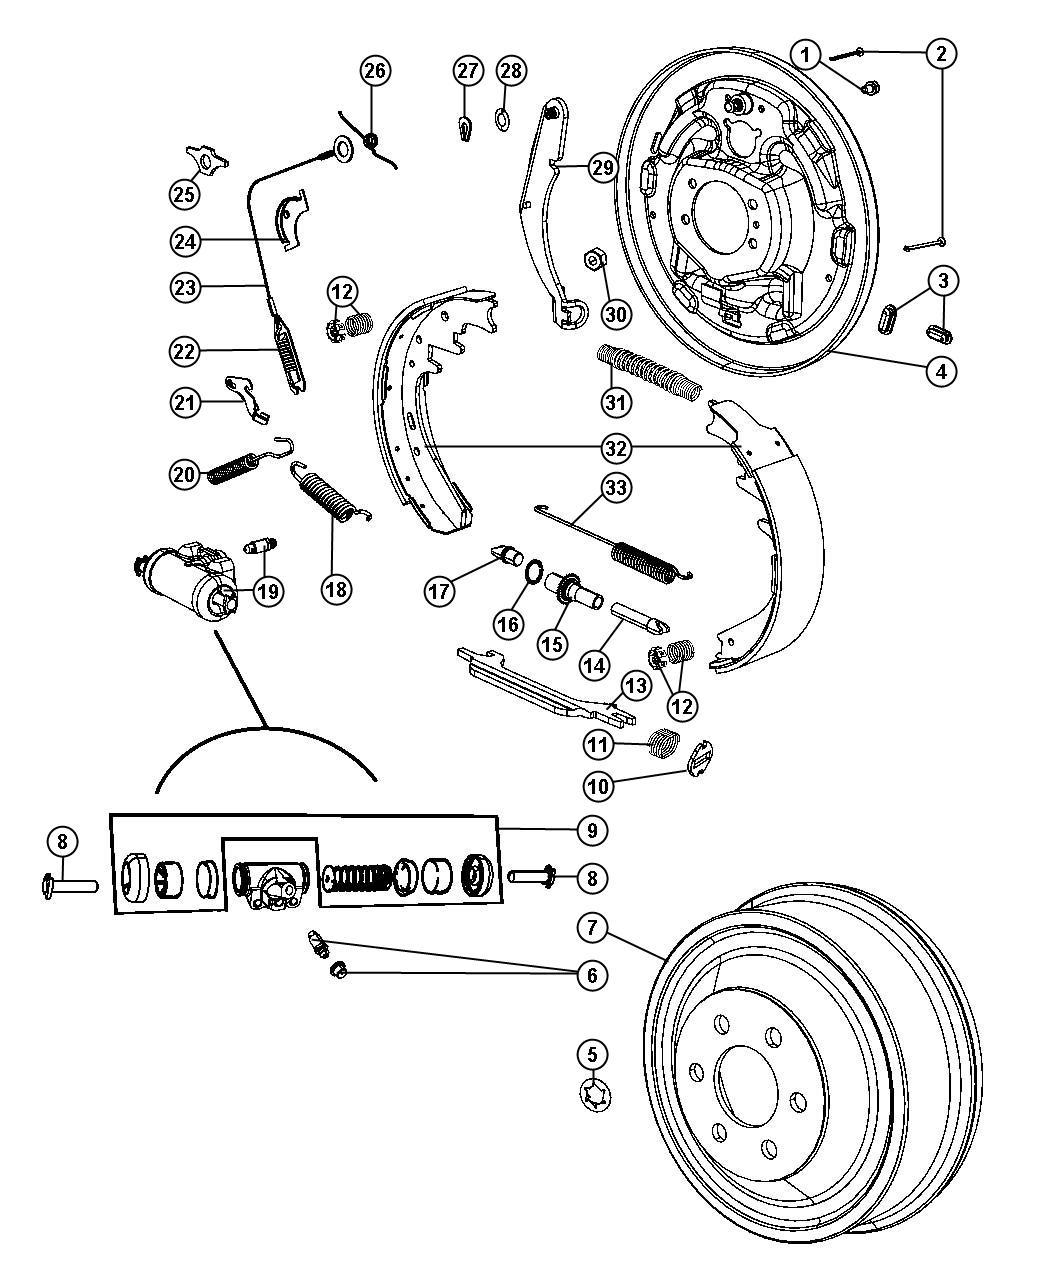 Mercedes Ml Fuse Box Diagram Auto Wiring. Mercedes. Auto